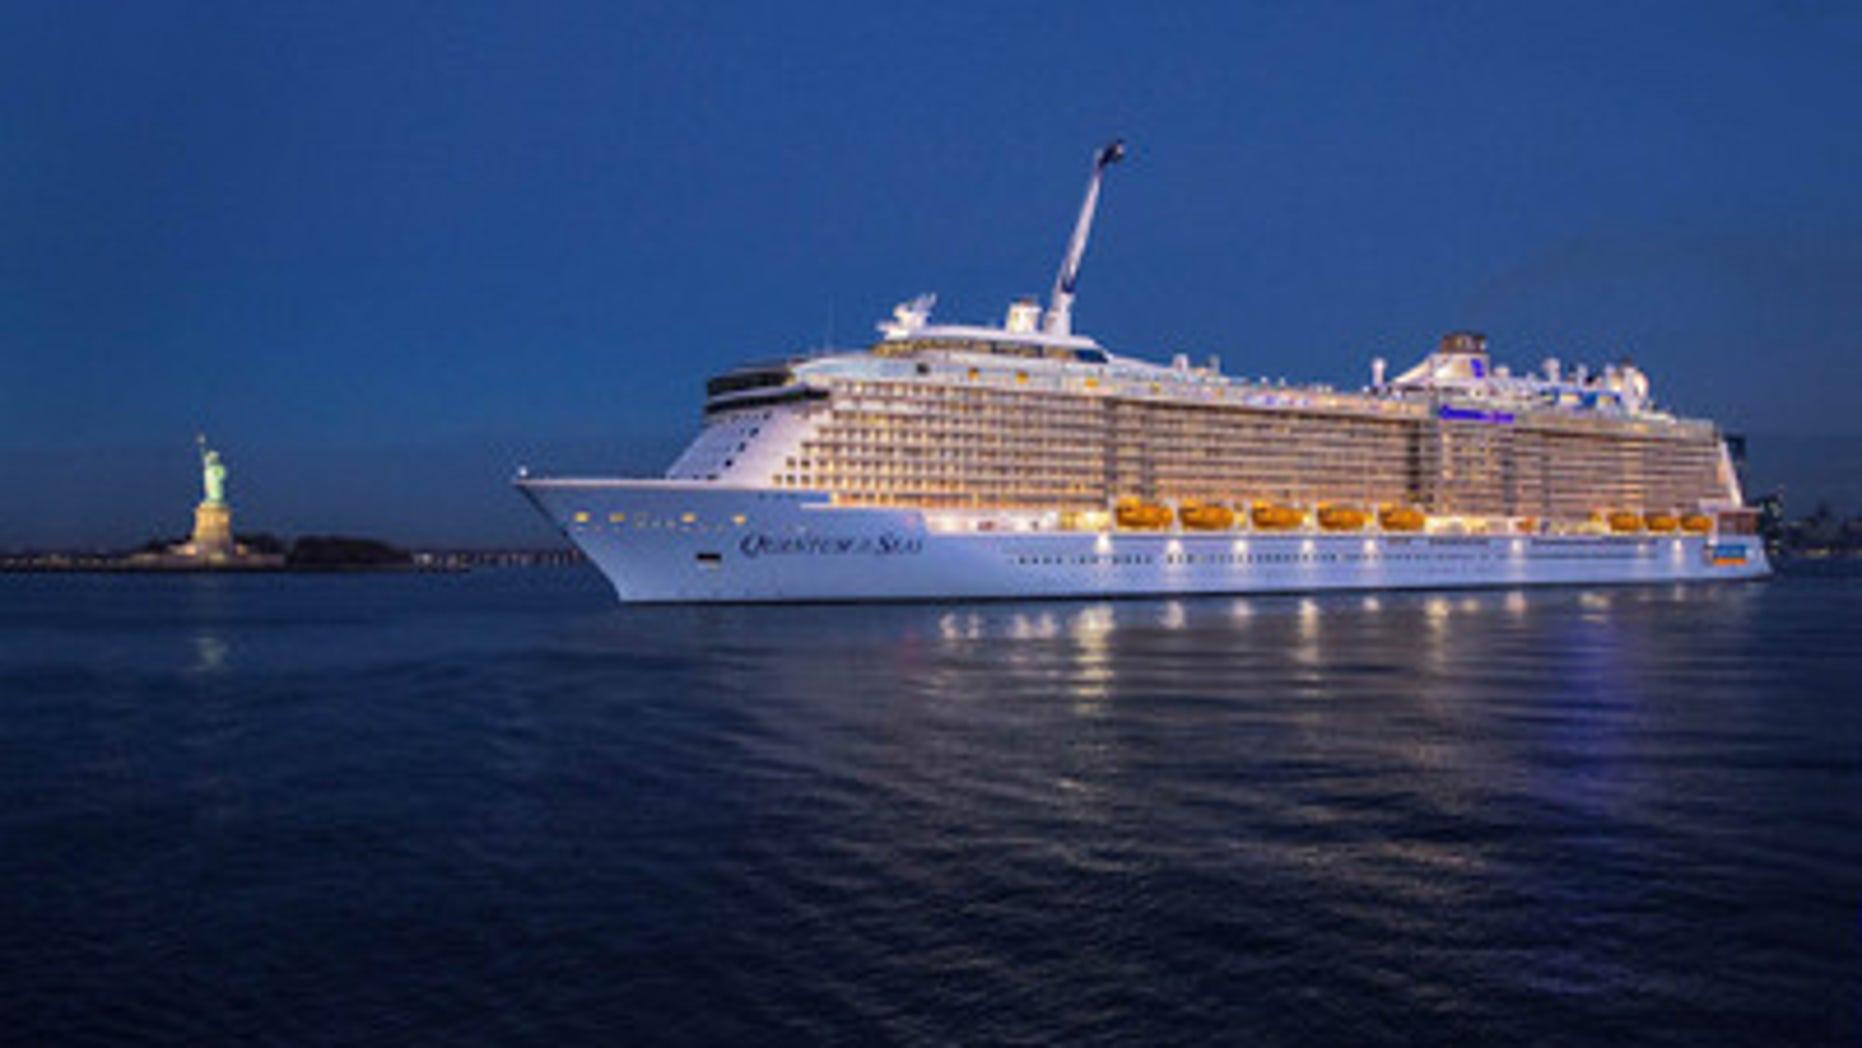 Royal Caribbean's newest ship Quantum of the Seas.